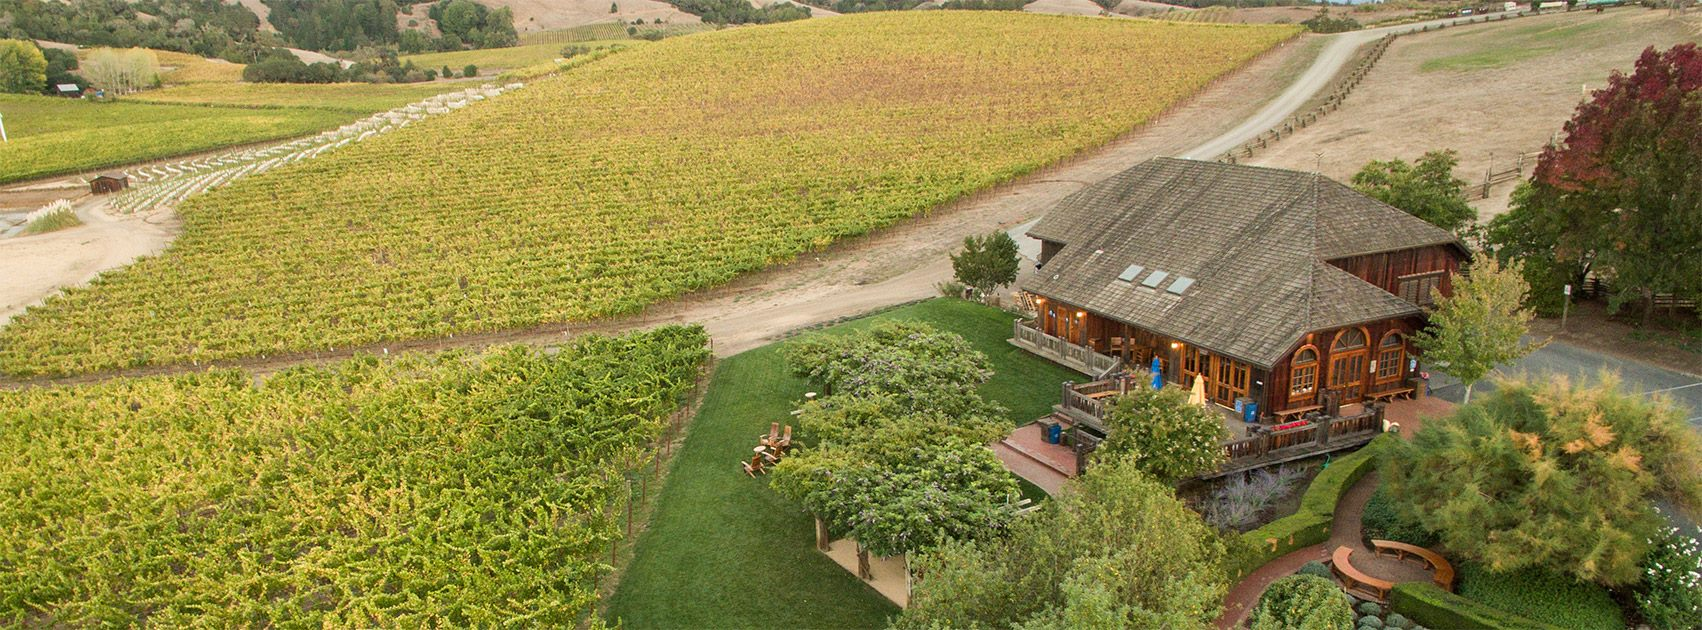 the Navarro Vineyards tasting room sits among vineyards